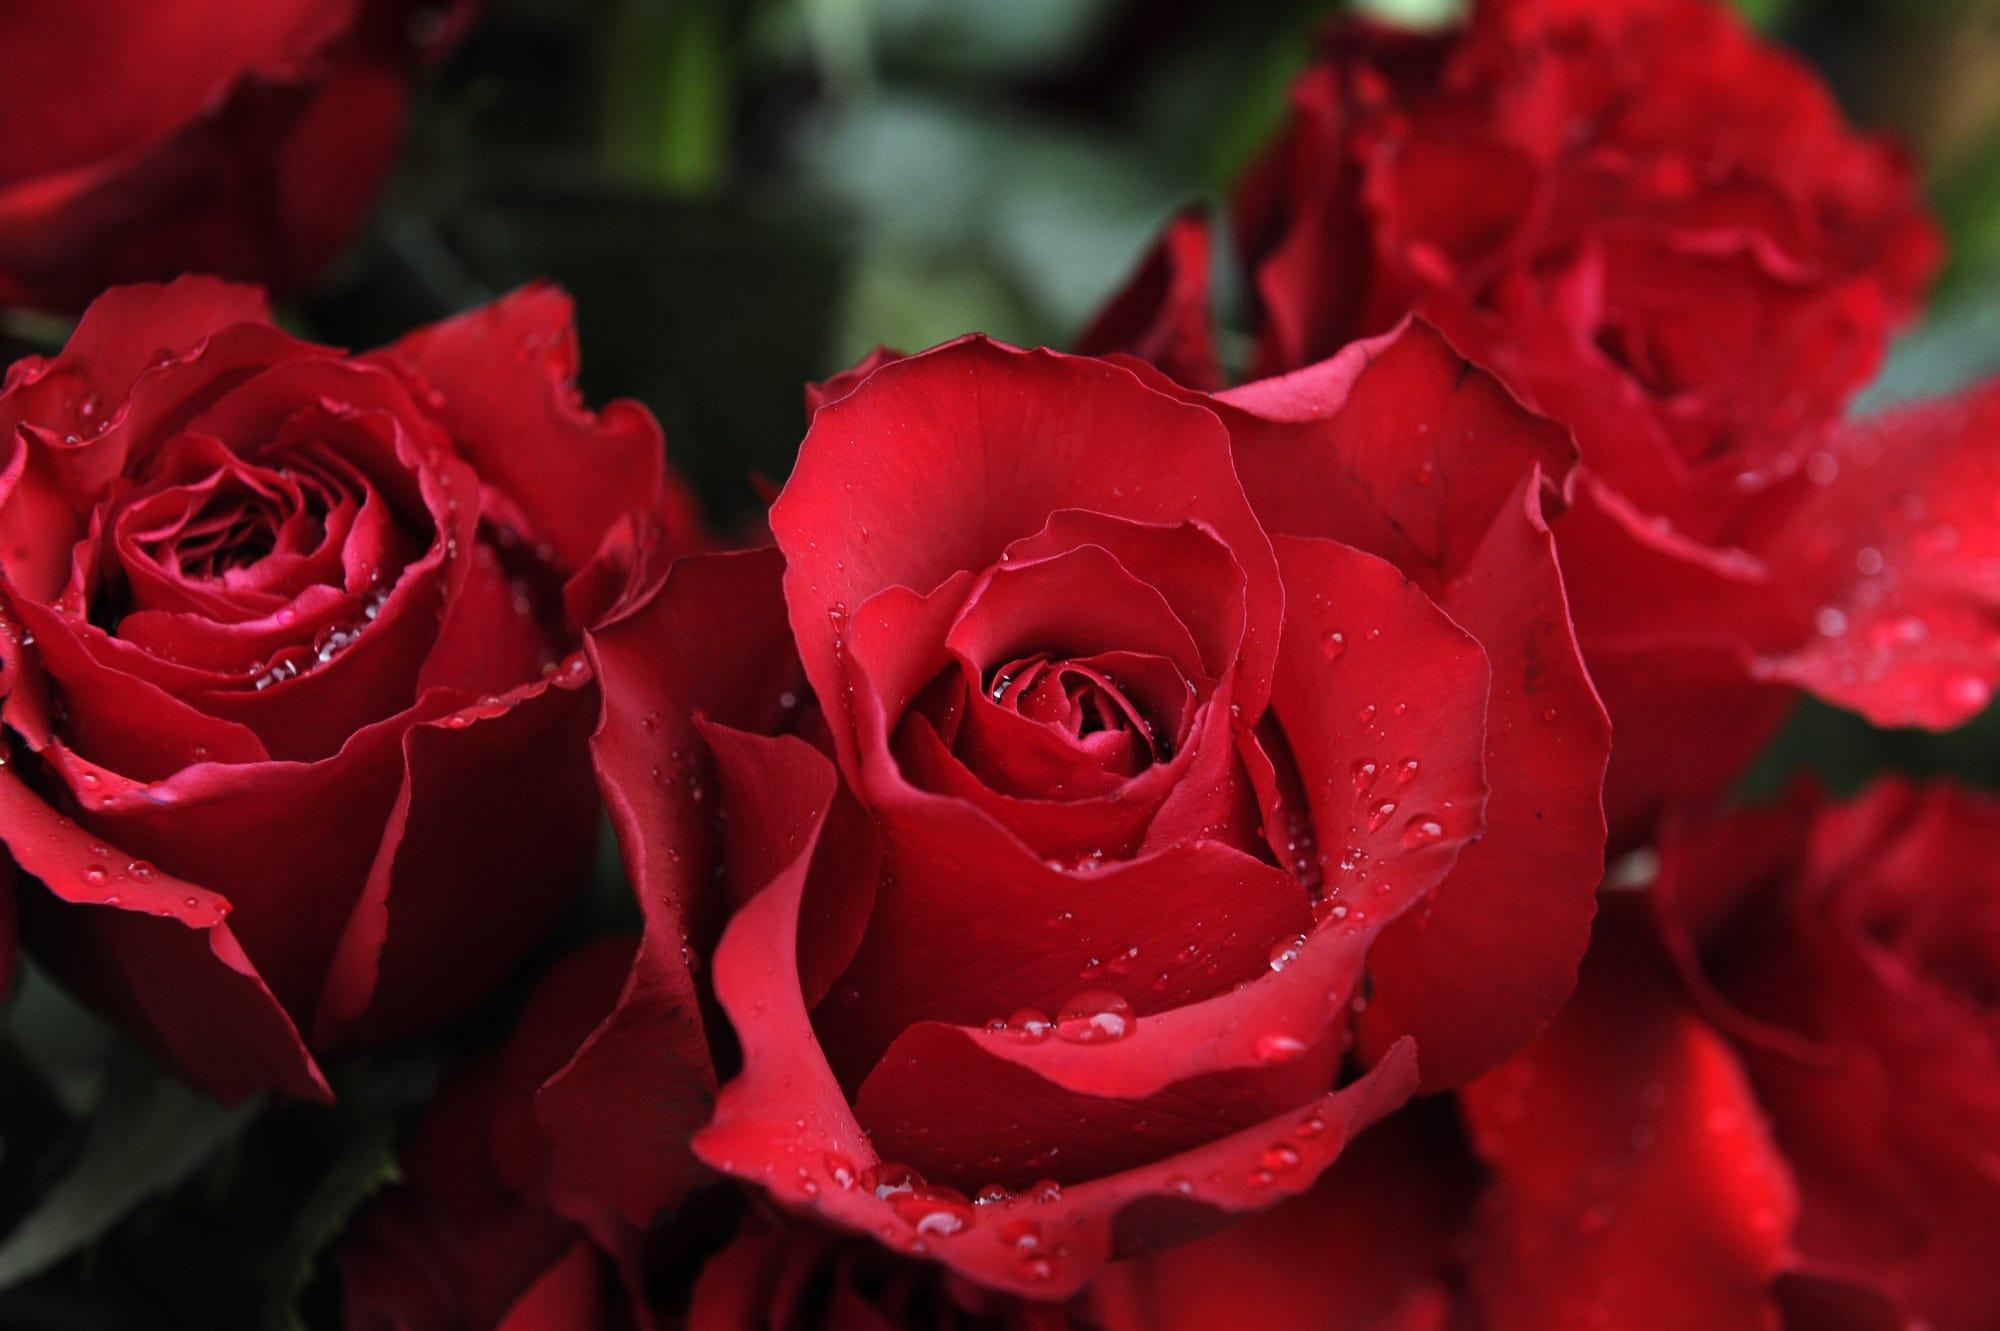 Kitty lov rose red tylerr | Porn images)